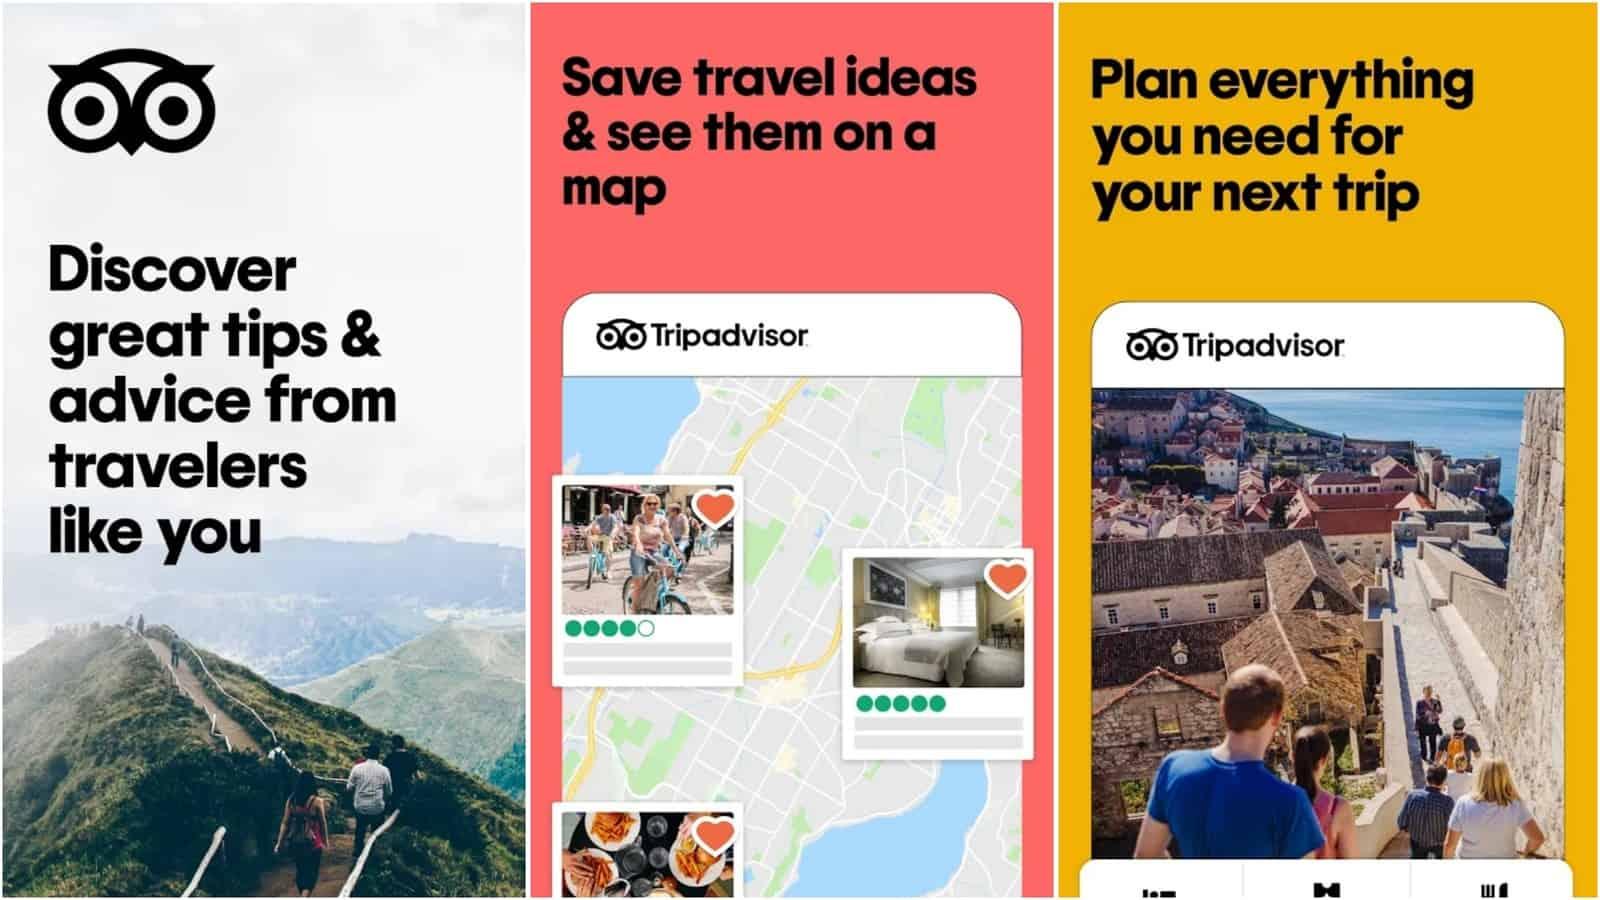 Tripadvisor app grid image